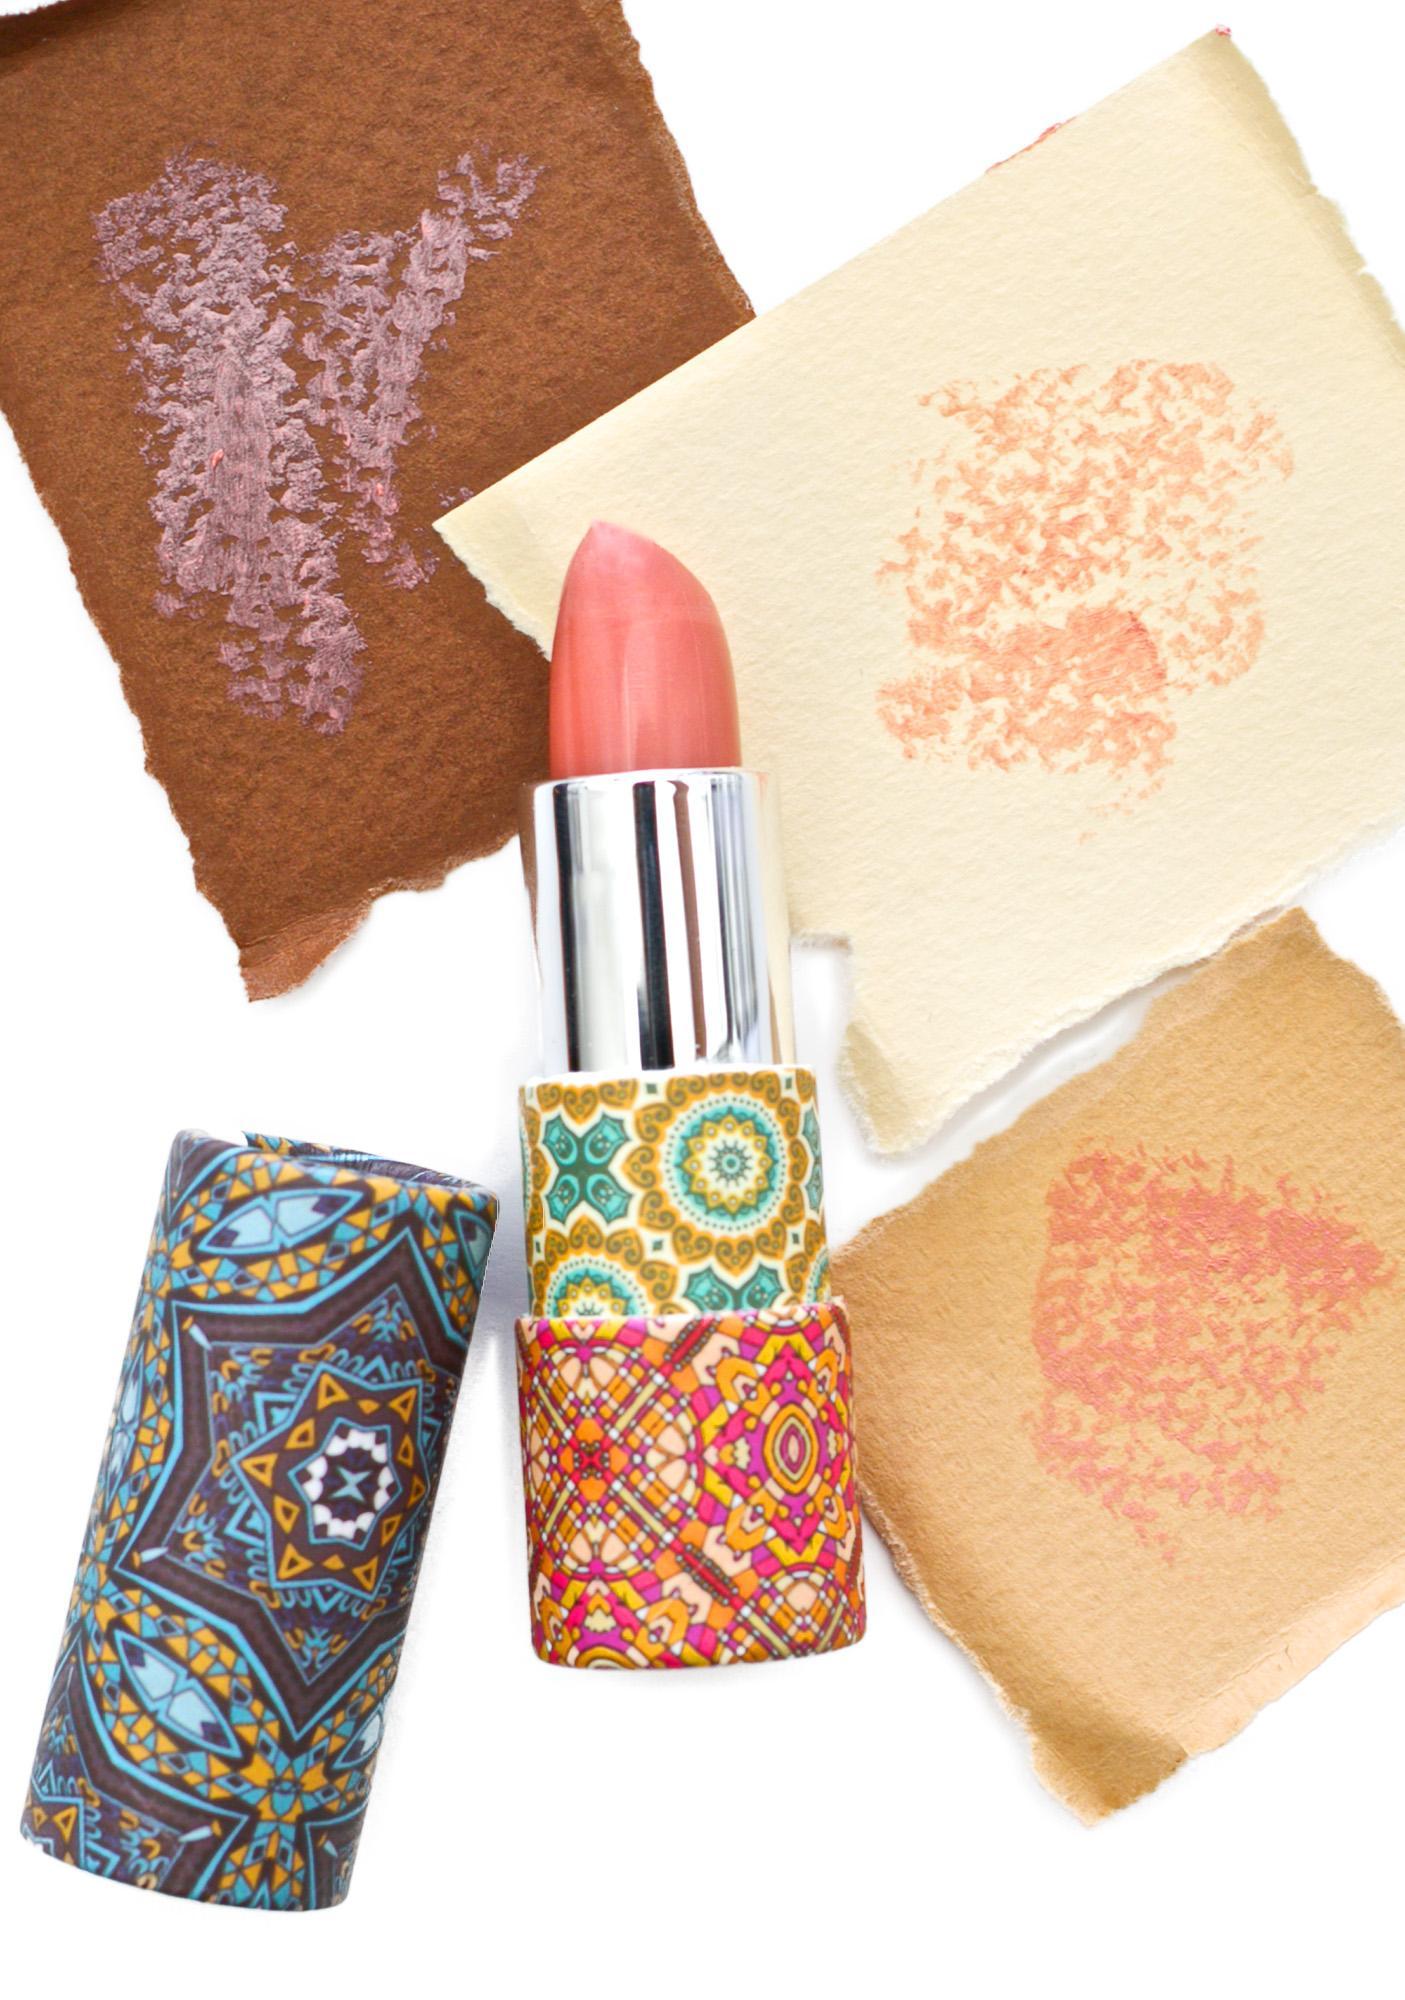 Moonchild Lipstick Mellow Lipstick